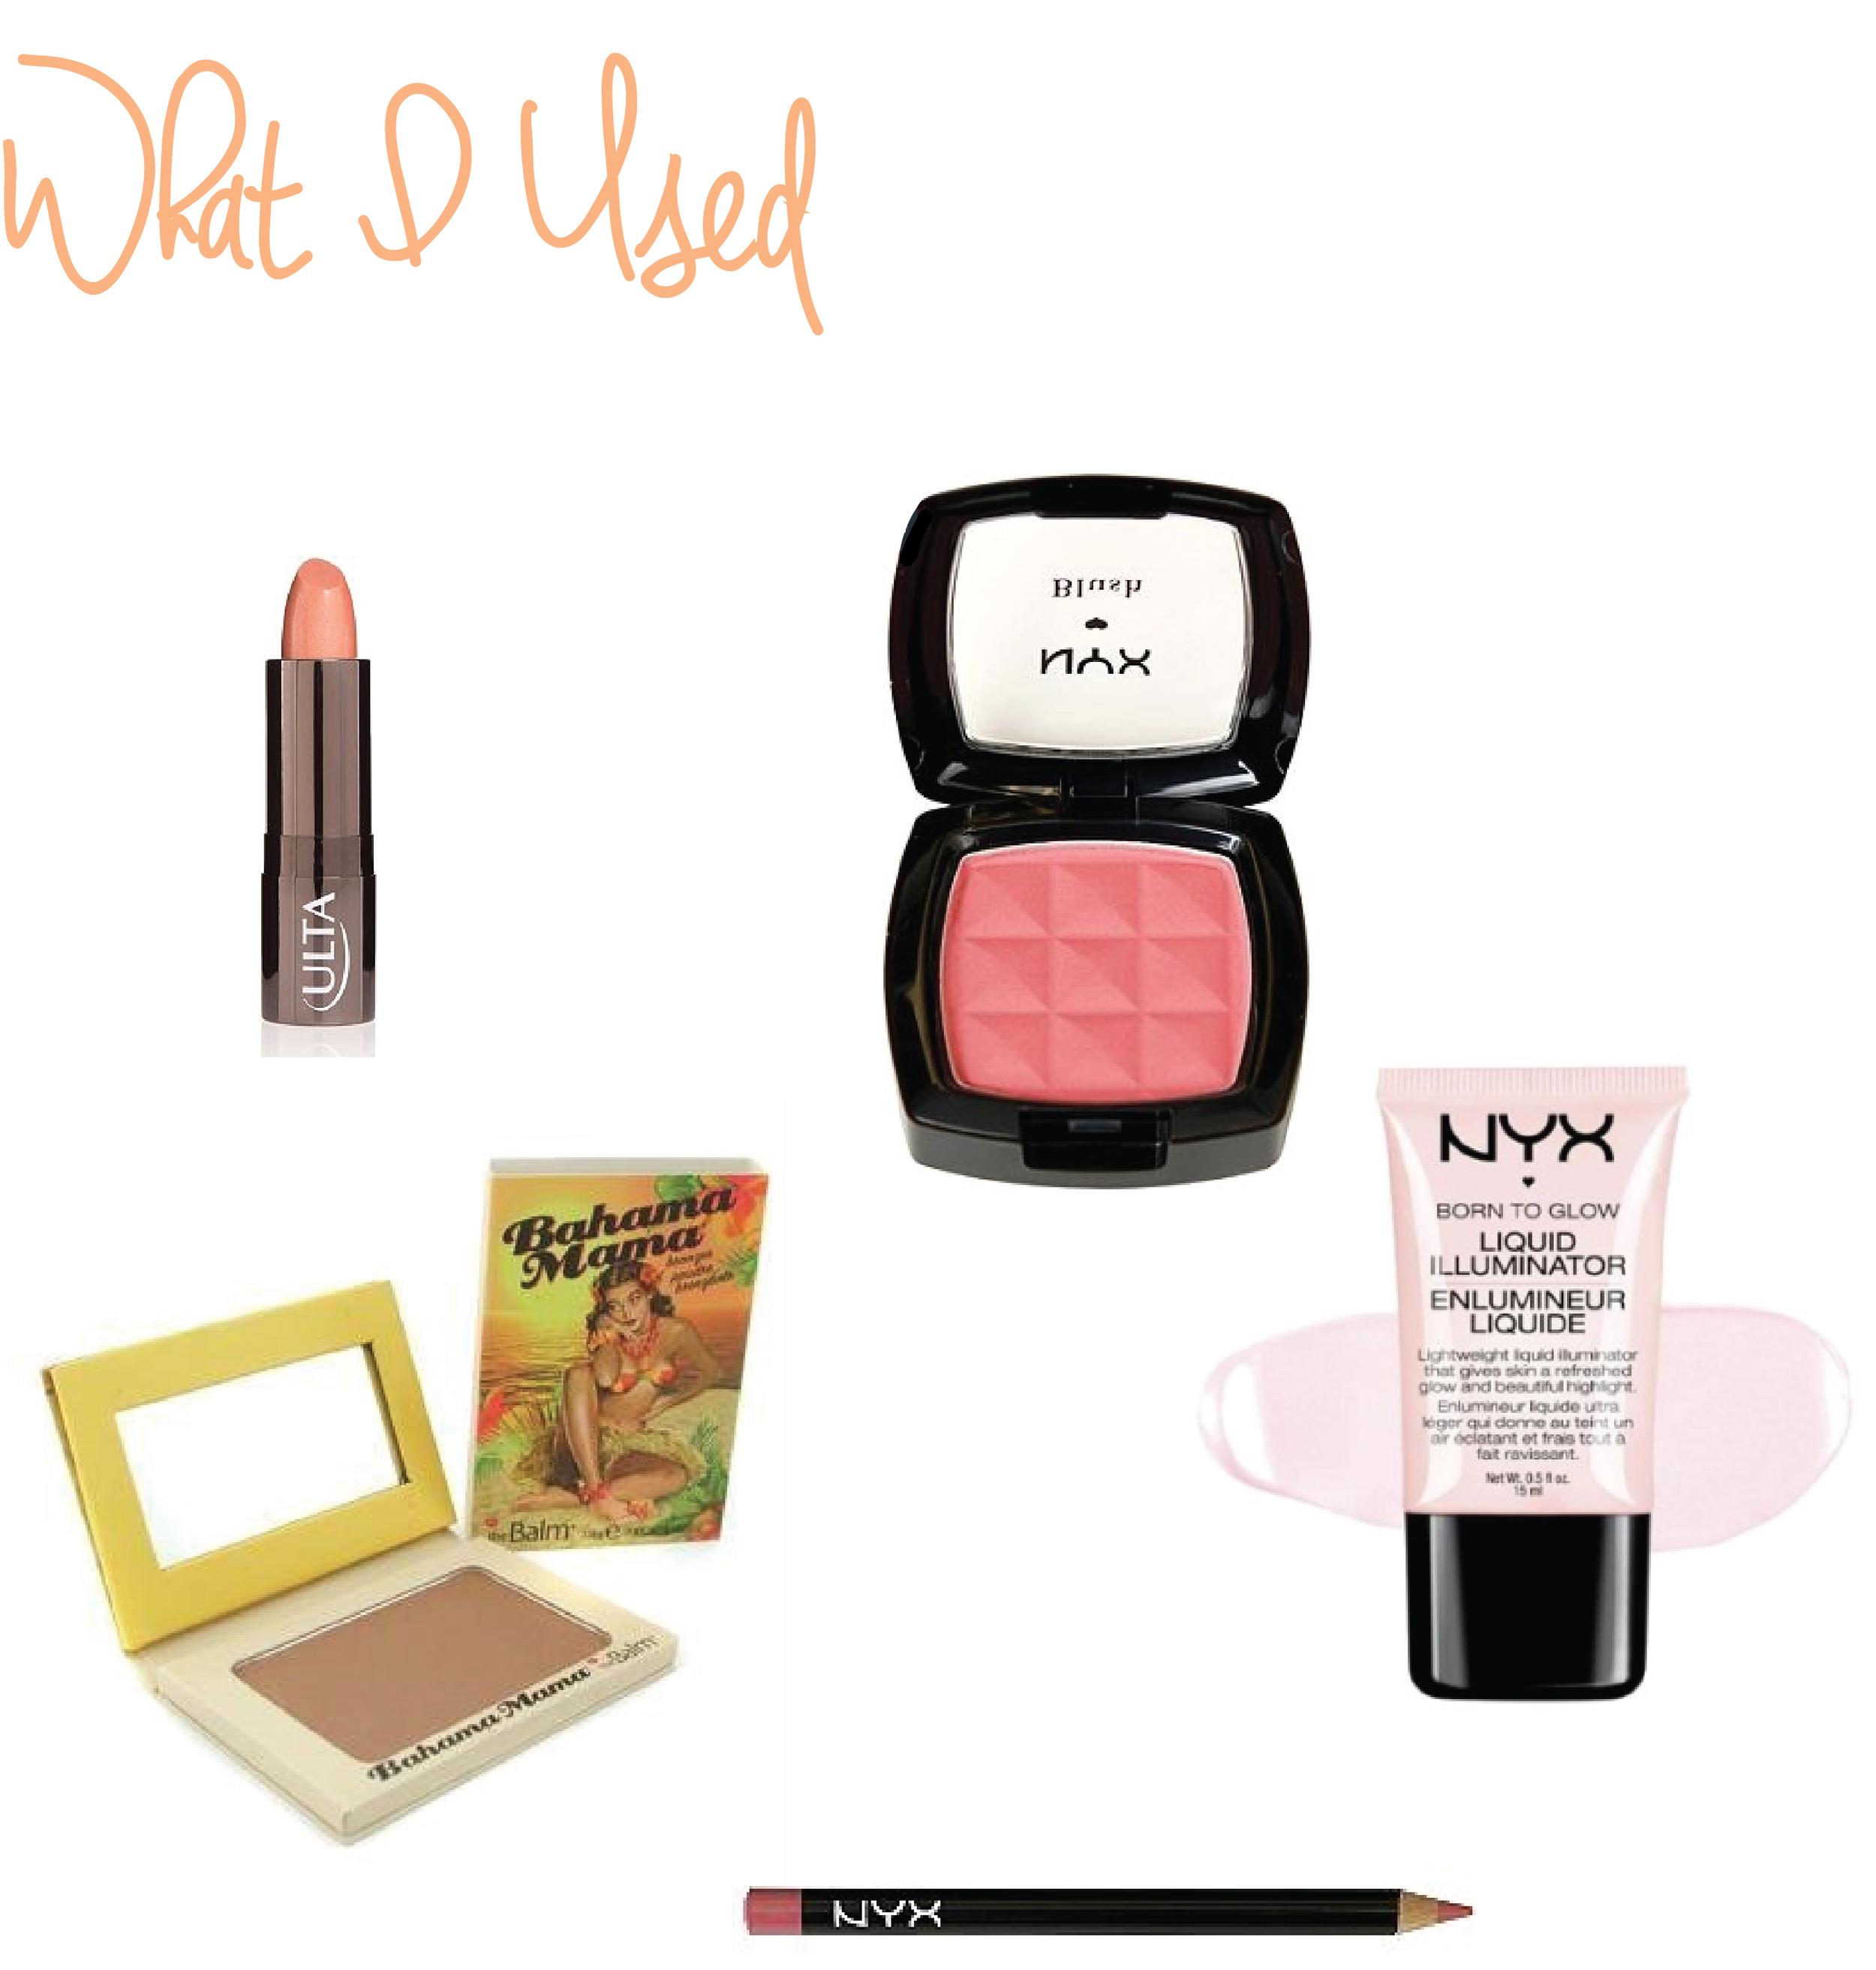 ULTA Brand Lipstick  in In the Buff • NYX Powder Blush  in Summer Peach •  Bahama Mama Bronzer  •  NYX Born to Glow Liquid Illuminator  •  NYX Lip Pencil  in Ever